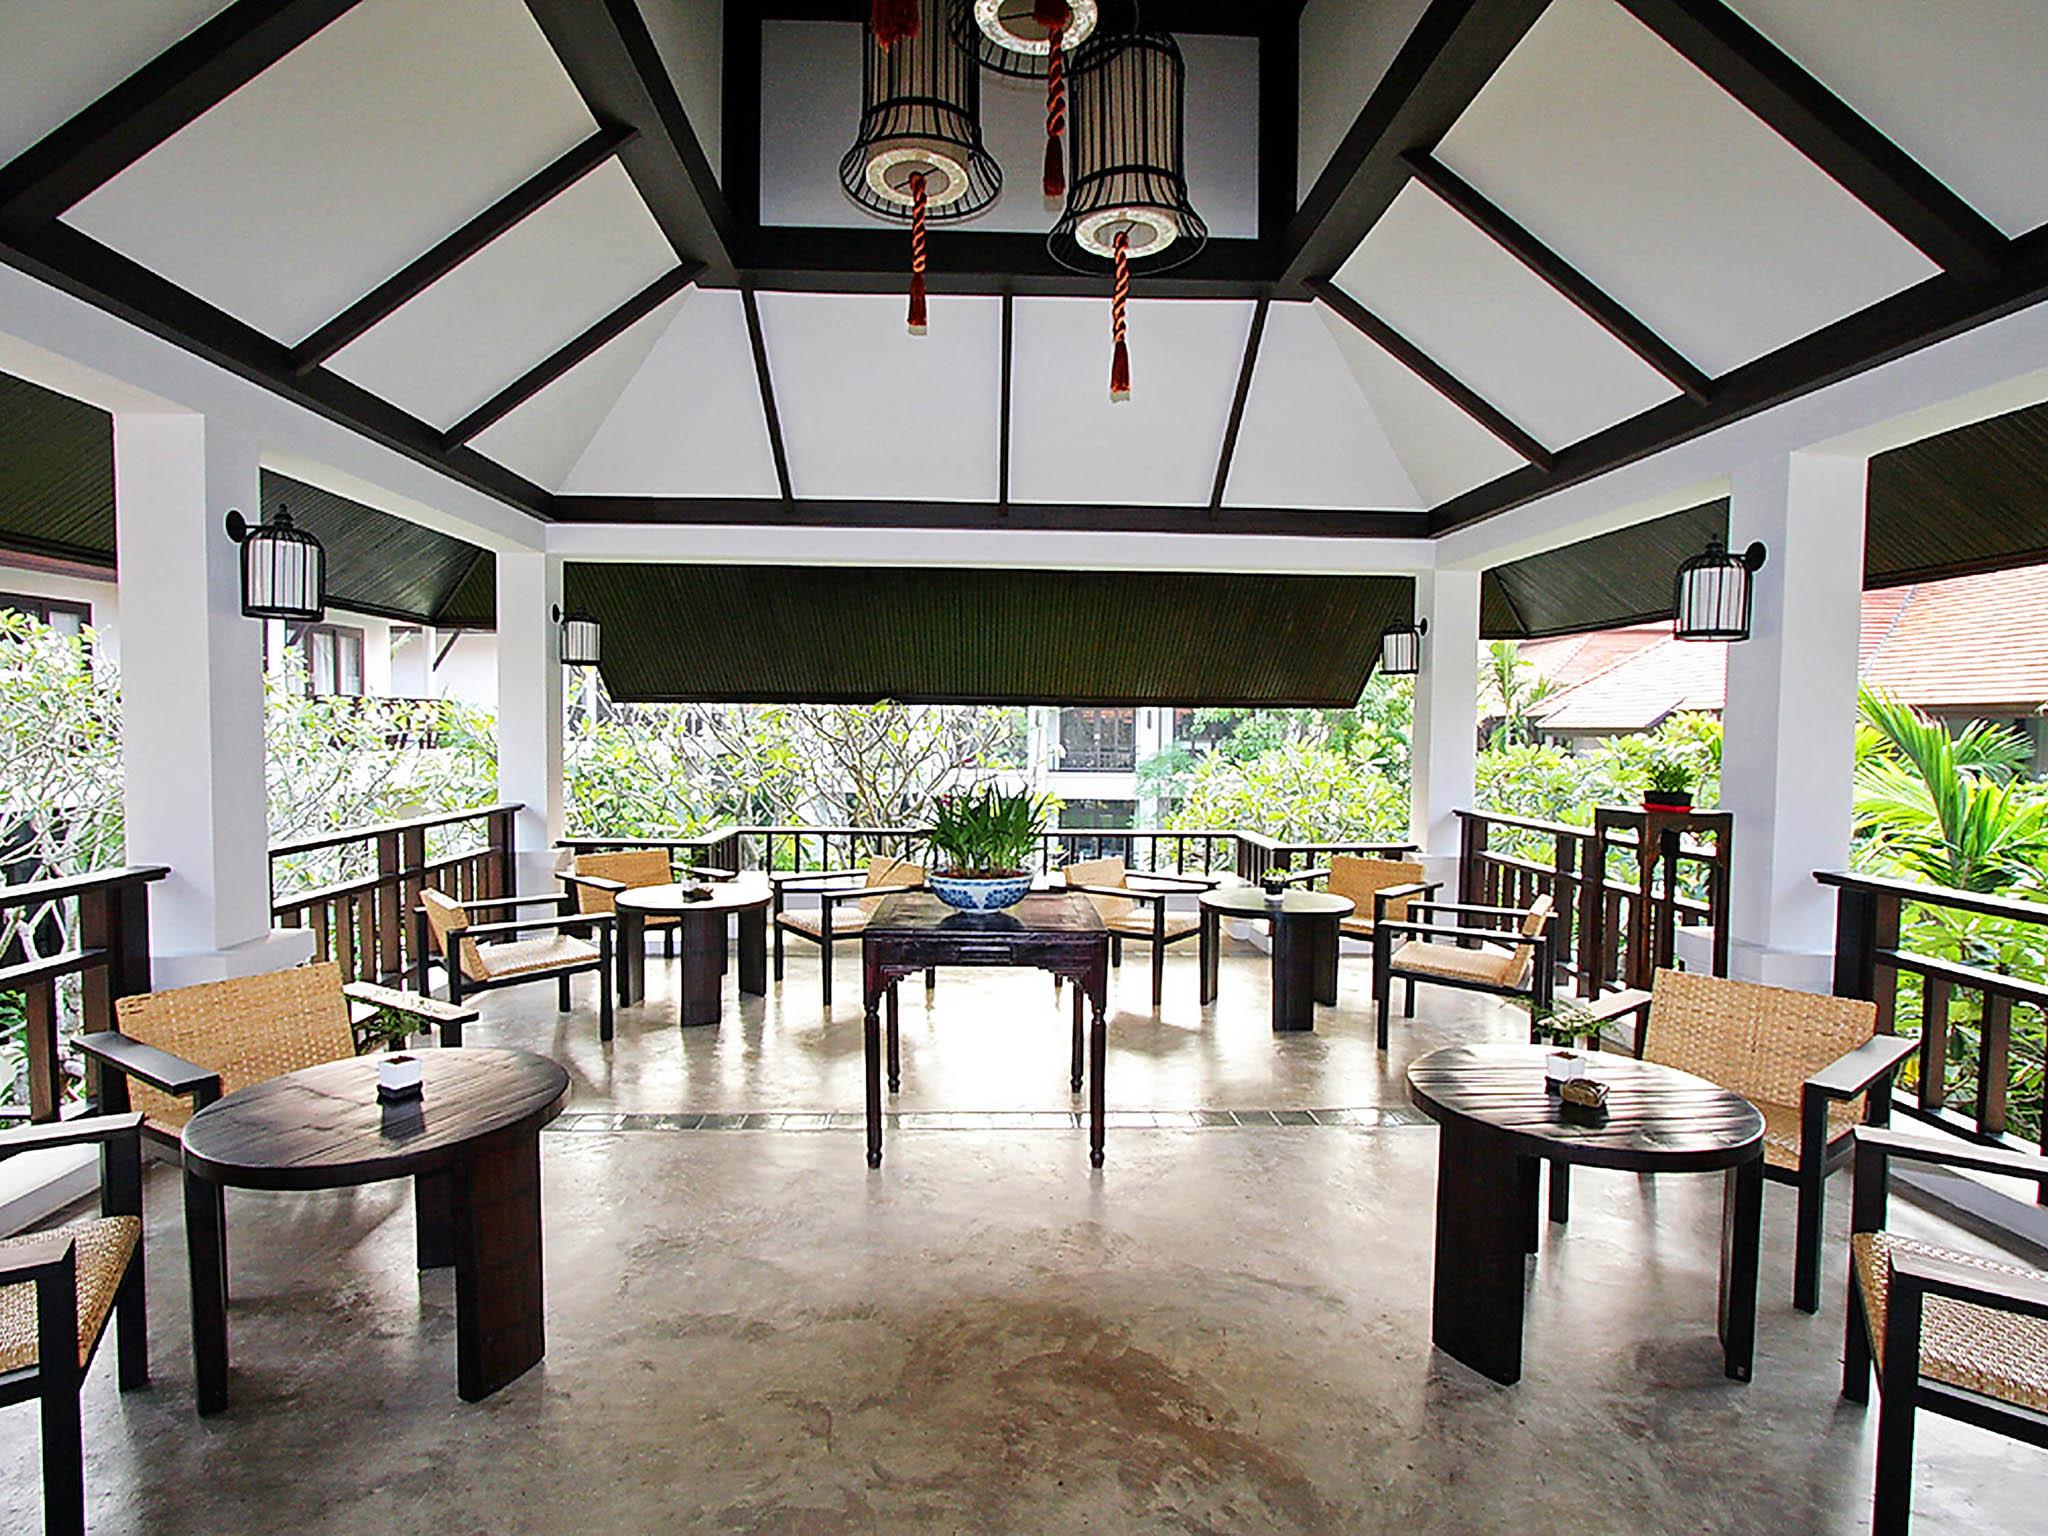 Restaurant bodhi serene a boutique hotel